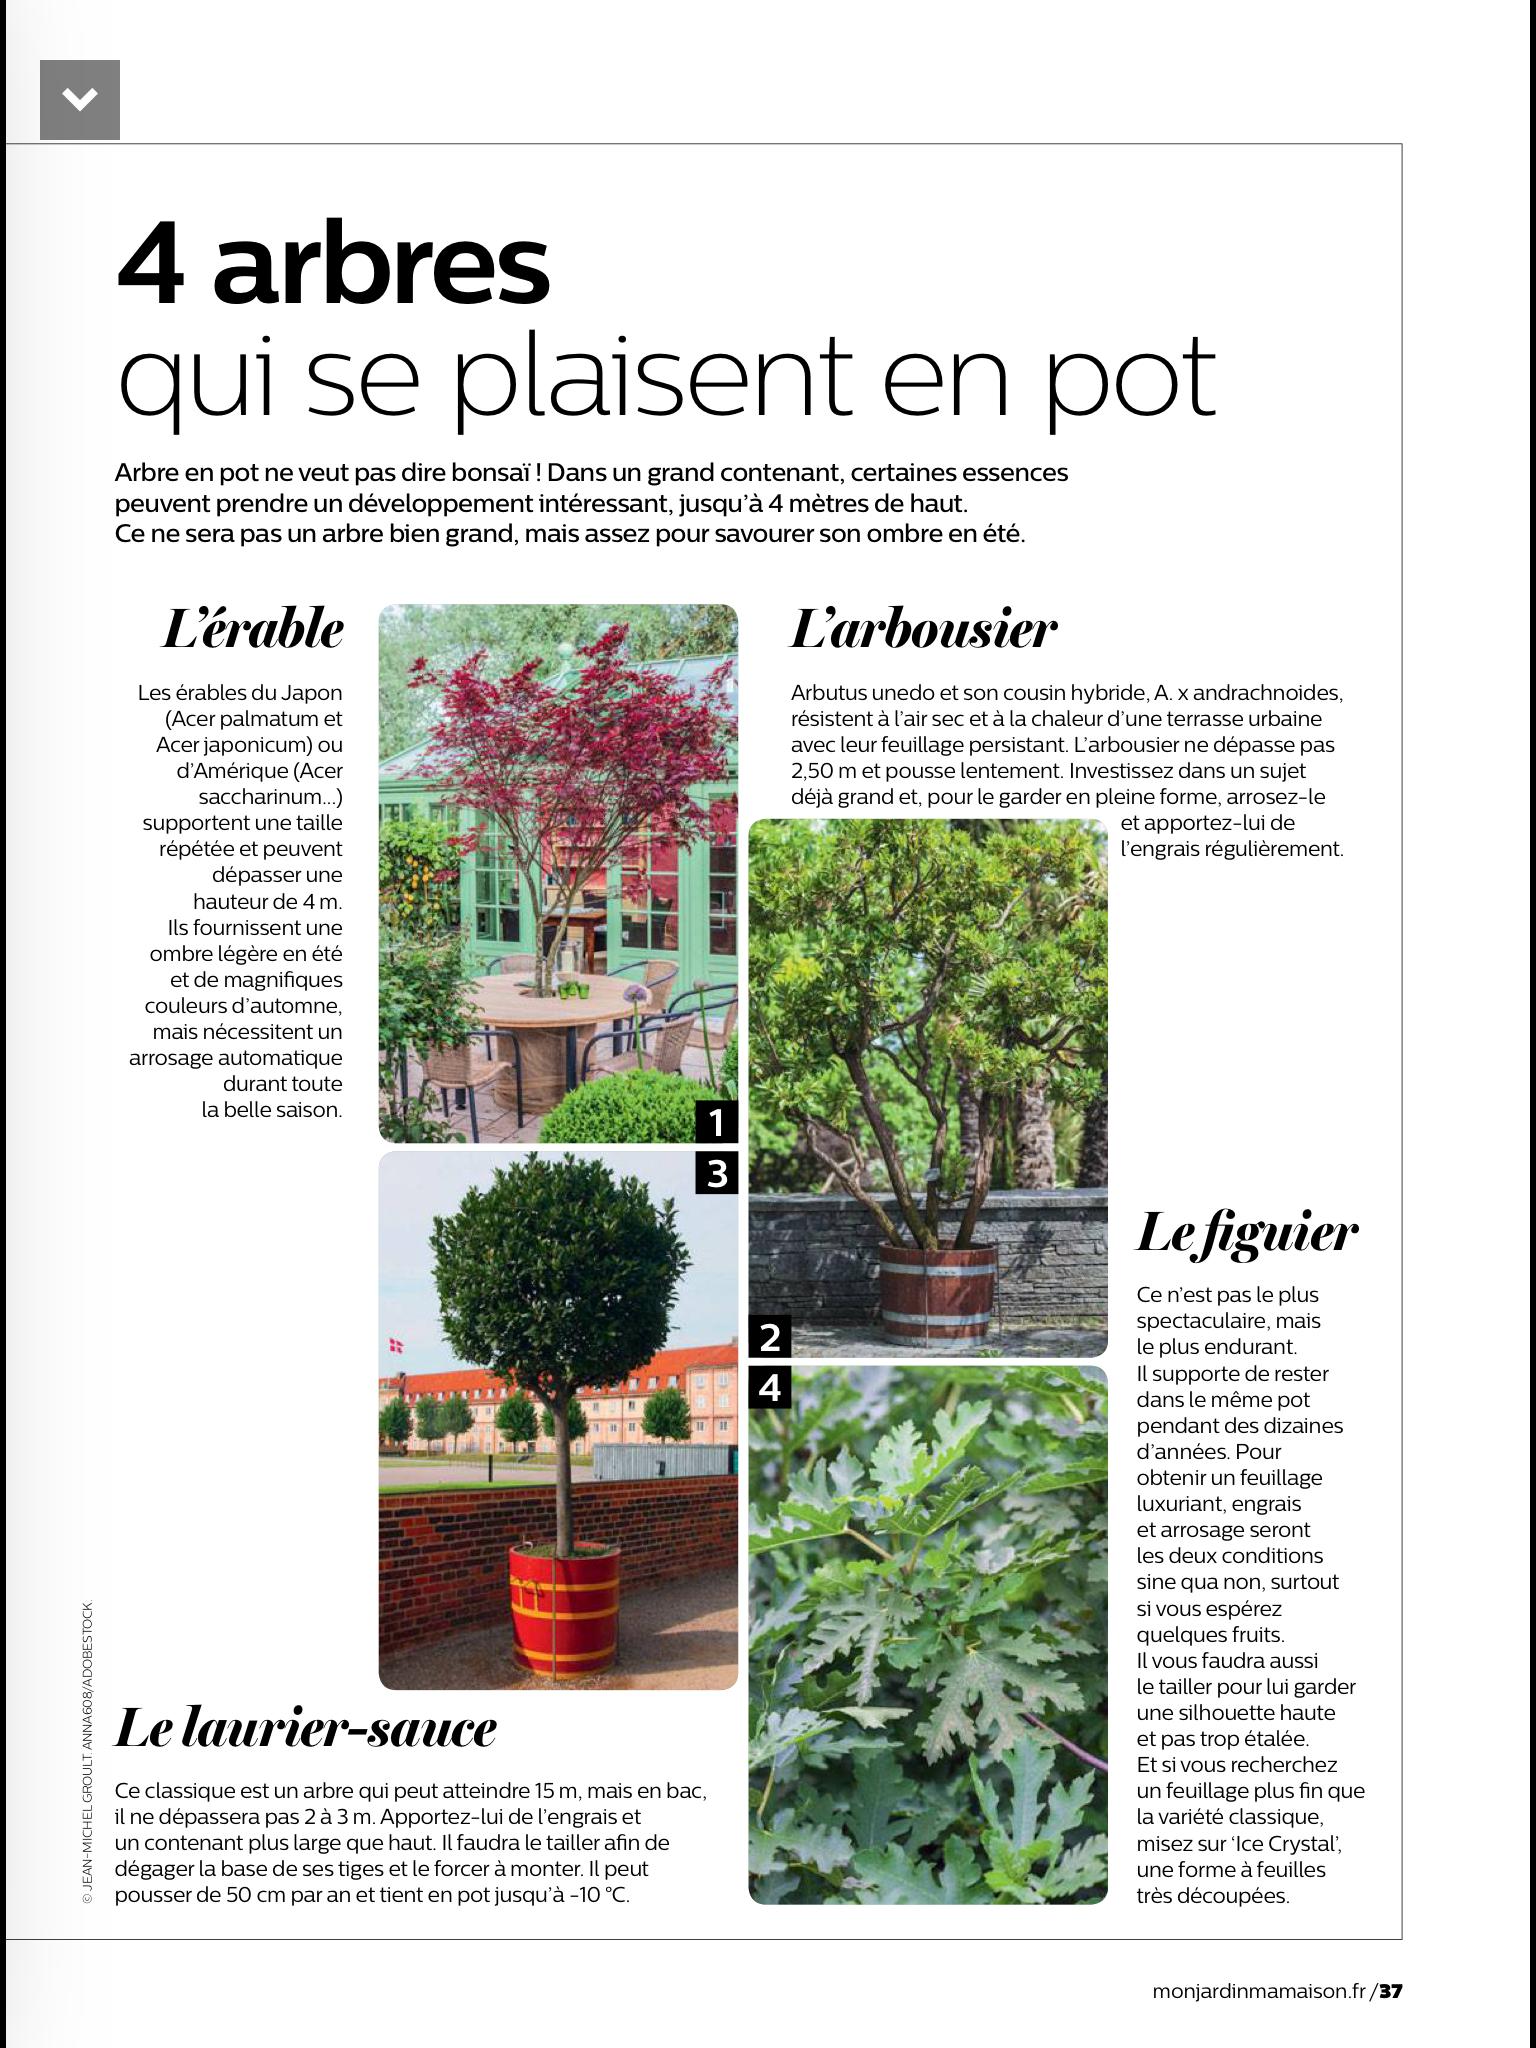 Arbre Persistant En Pot les arbres en pot | arbres en pots, jardins et arbousier